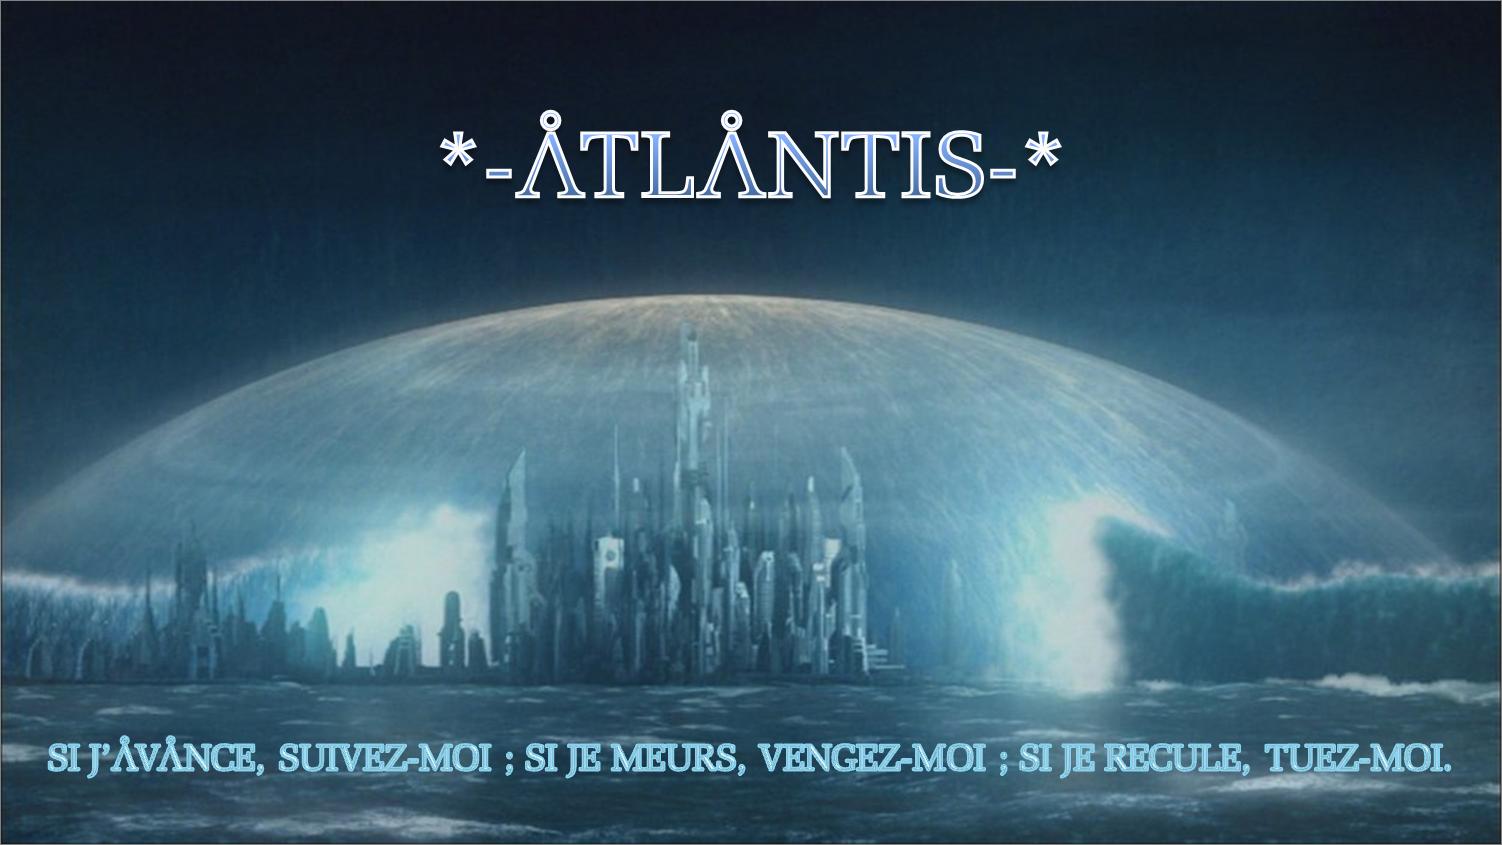 *-ATLANTIS-* 425164Image1